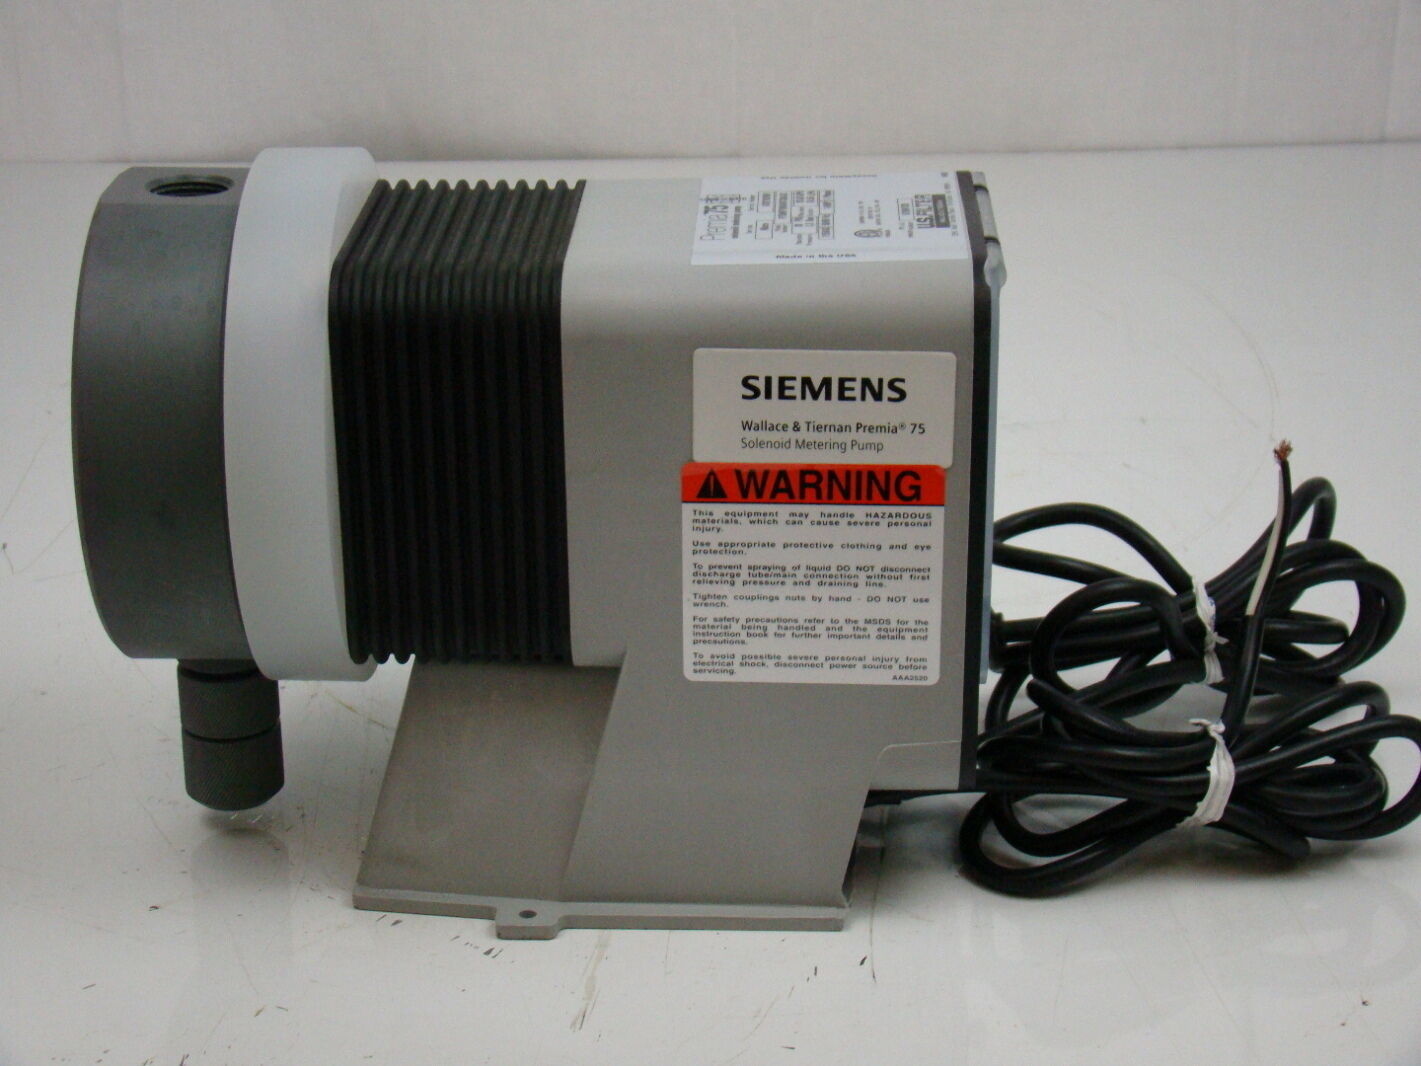 Premia 75 Solenoid Metering Pump P75MP79RAWTCBAXX | Joseph Fazzio, Incorporated